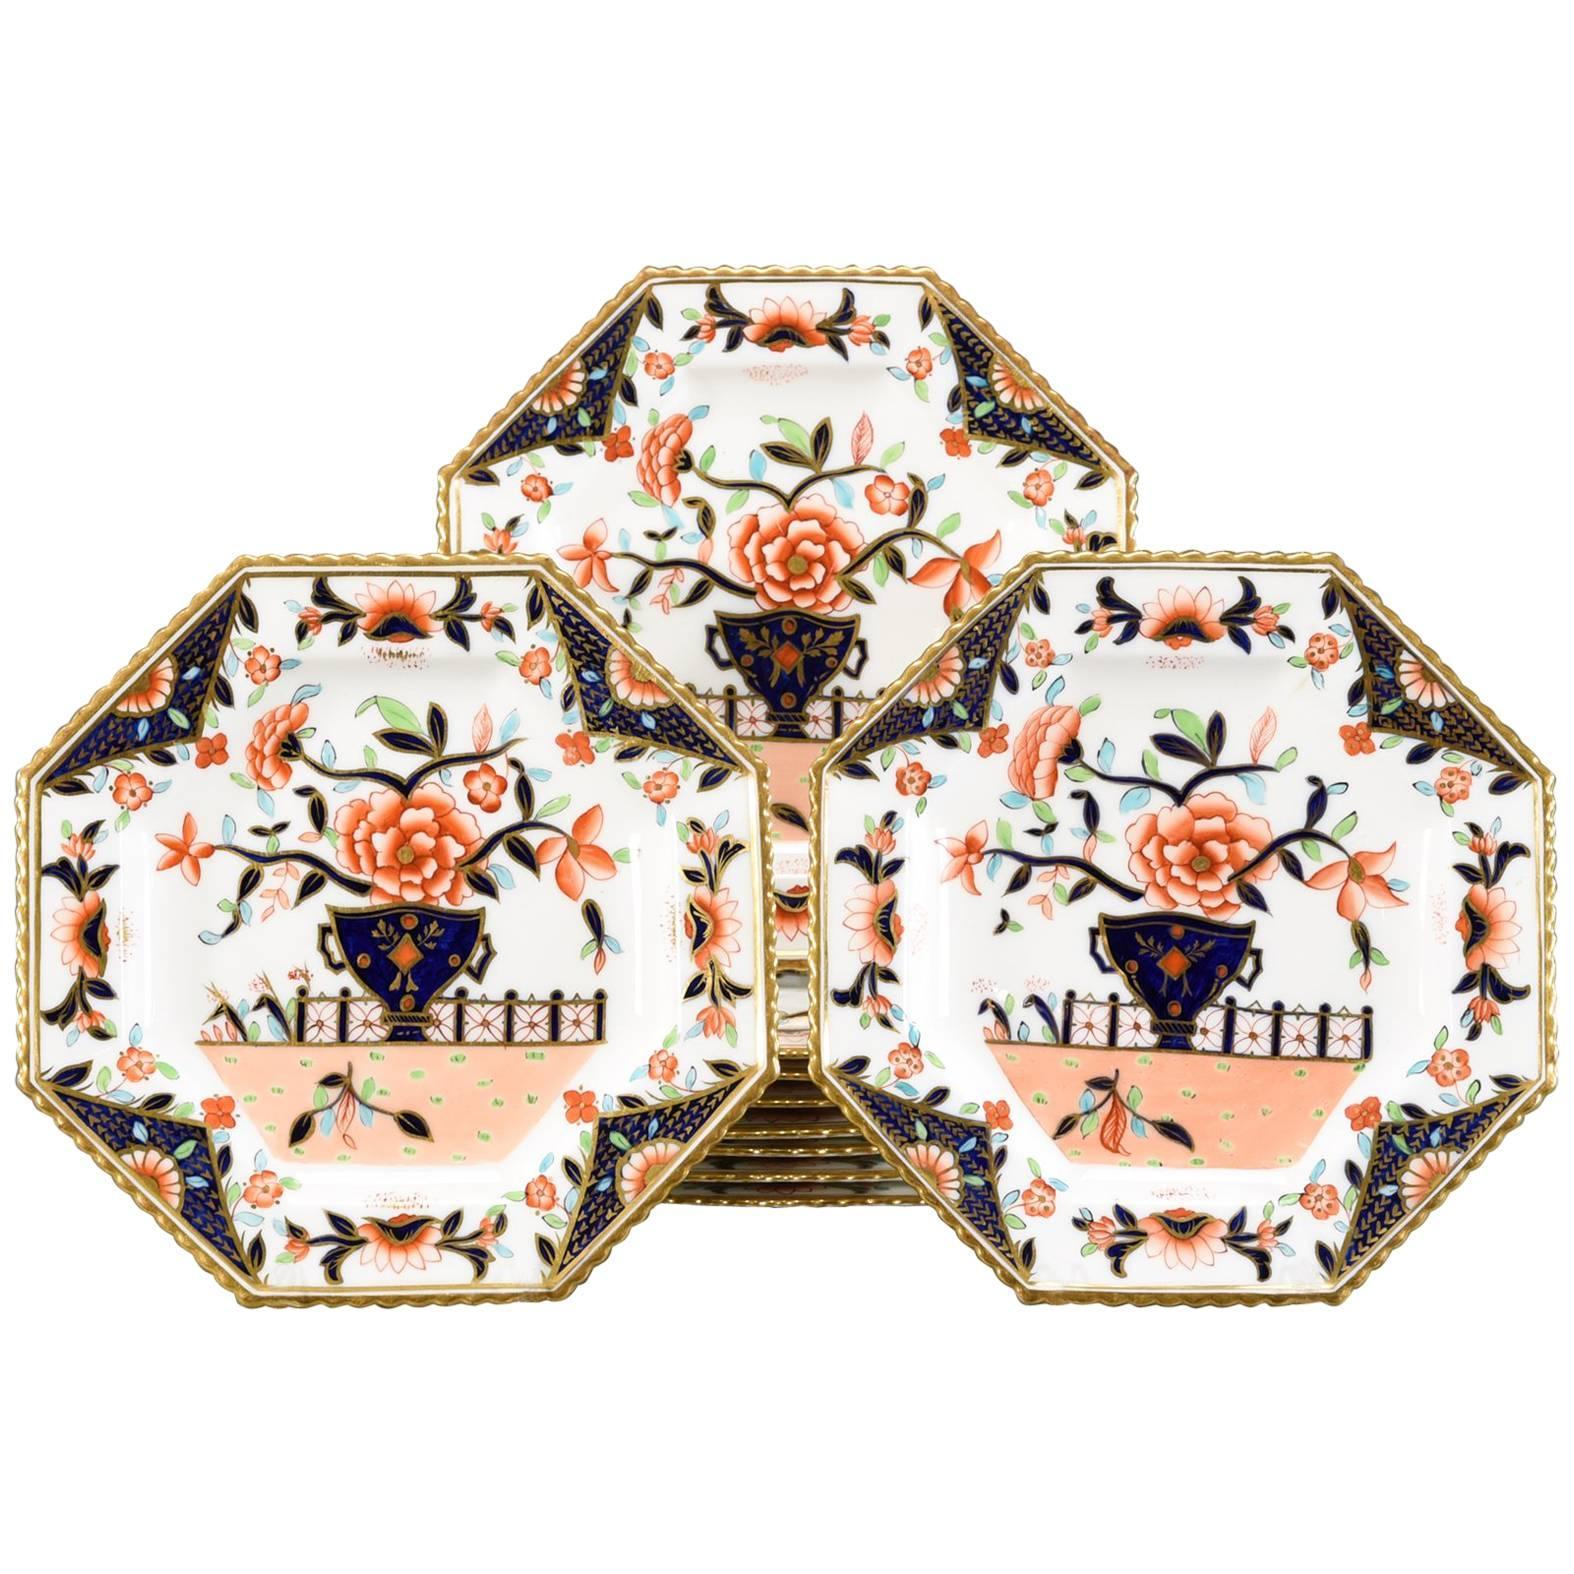 Ten Coalport Octagonal Imari Dessert Plates Aesthetic Movement Dated 1891